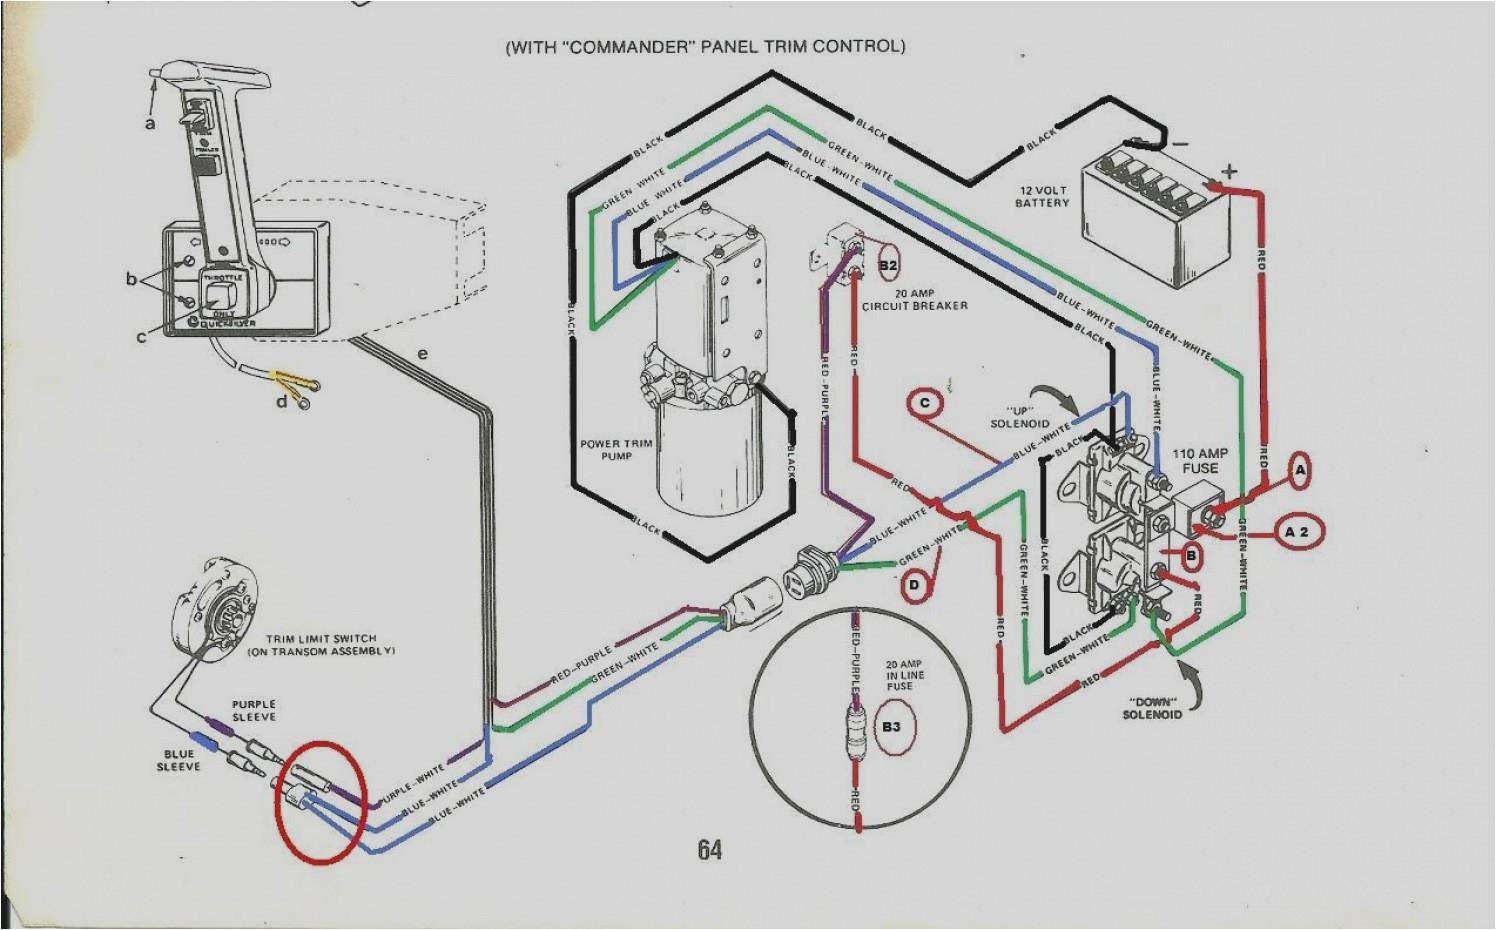 36 volt wiring diagram wiring diagram post 36 volt wiring color diagram